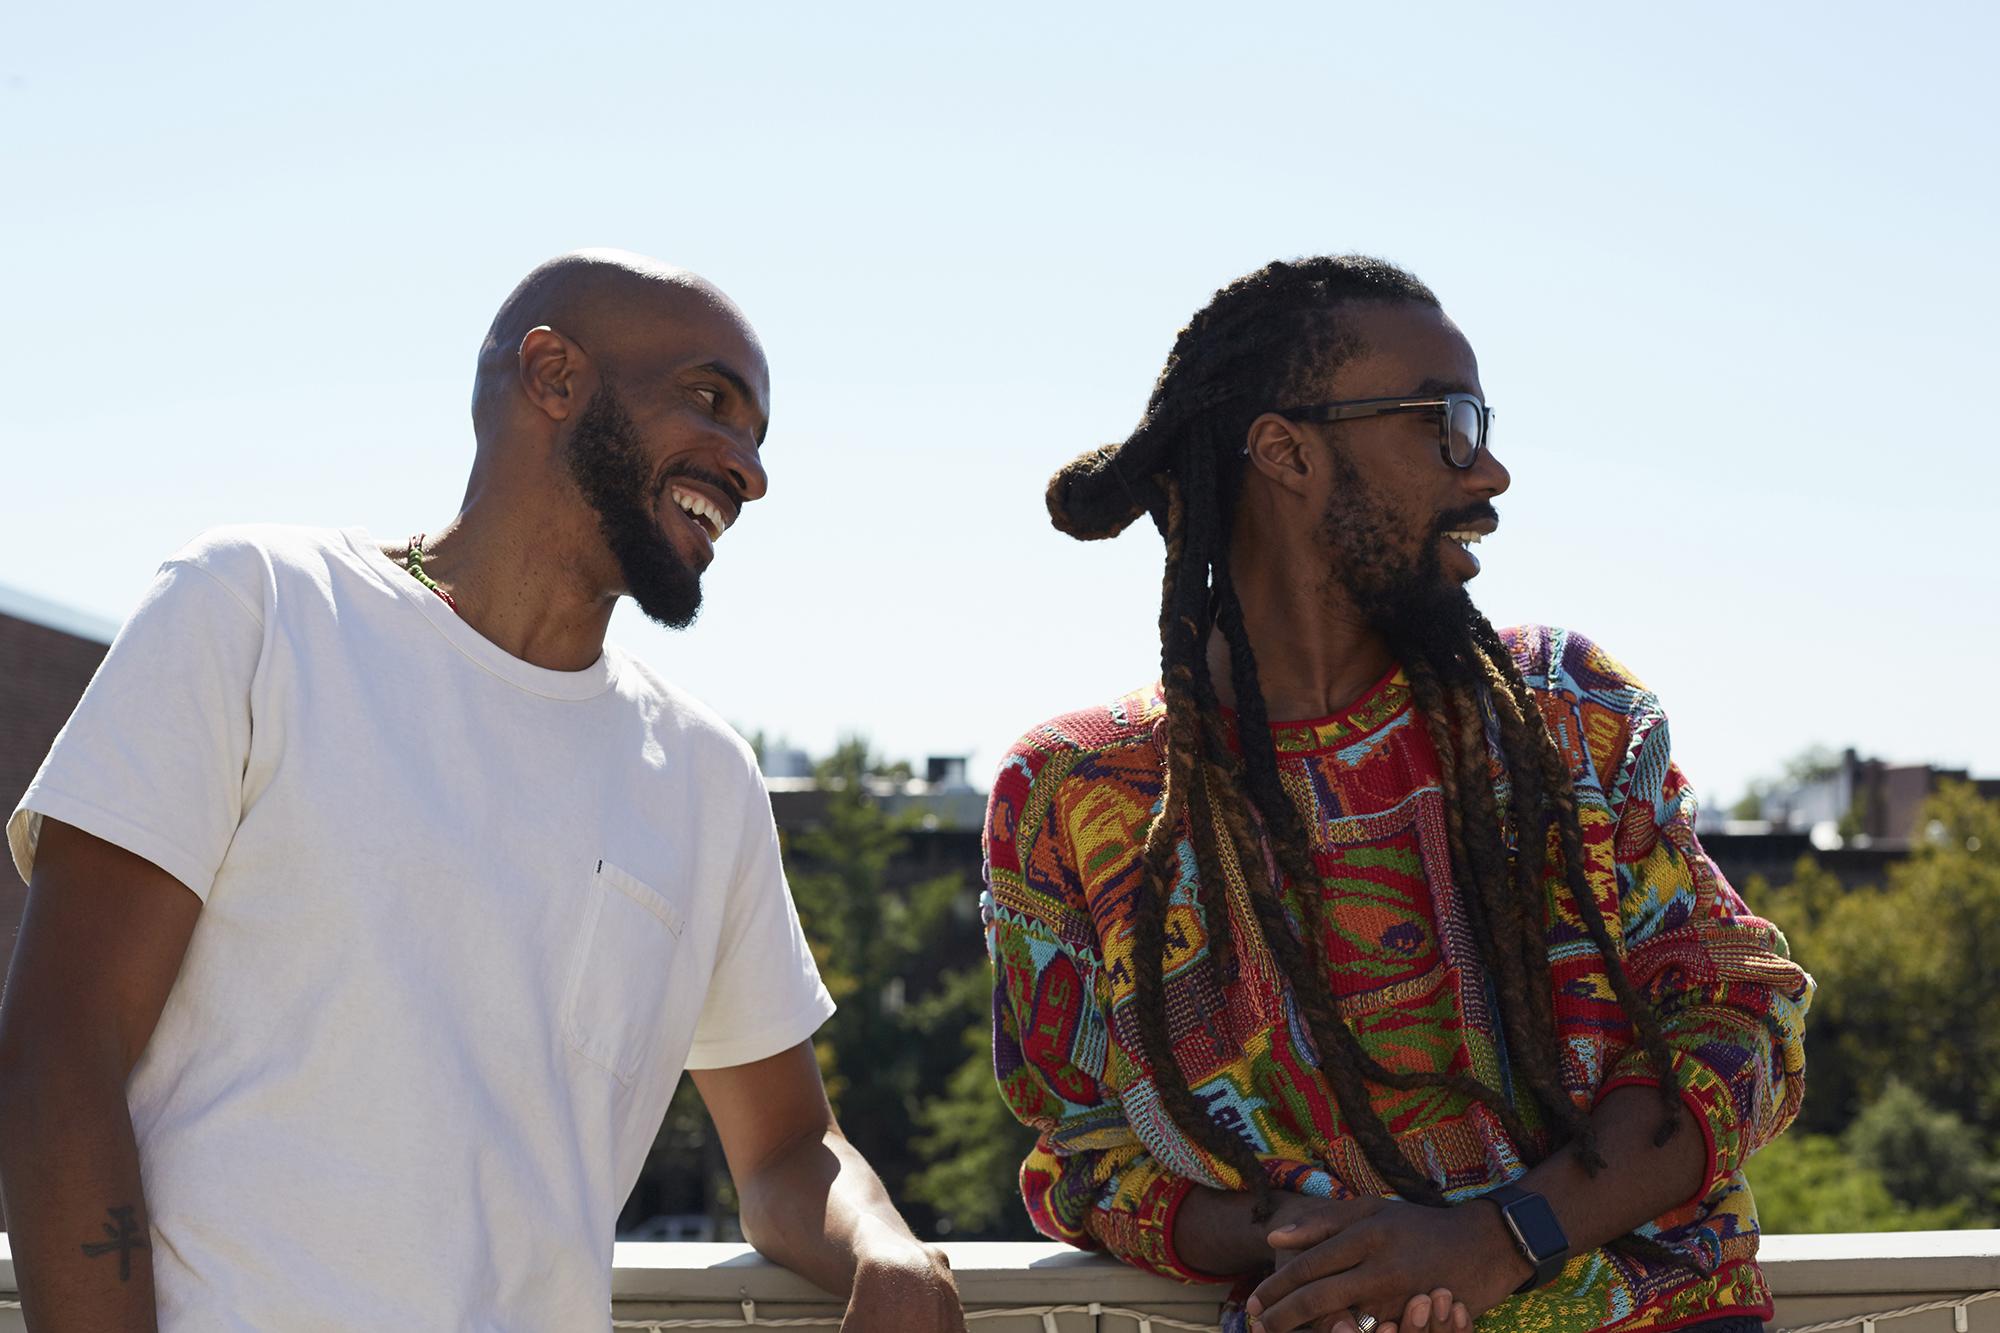 Julian and Yahdon share a laugh on Julian's balcony.